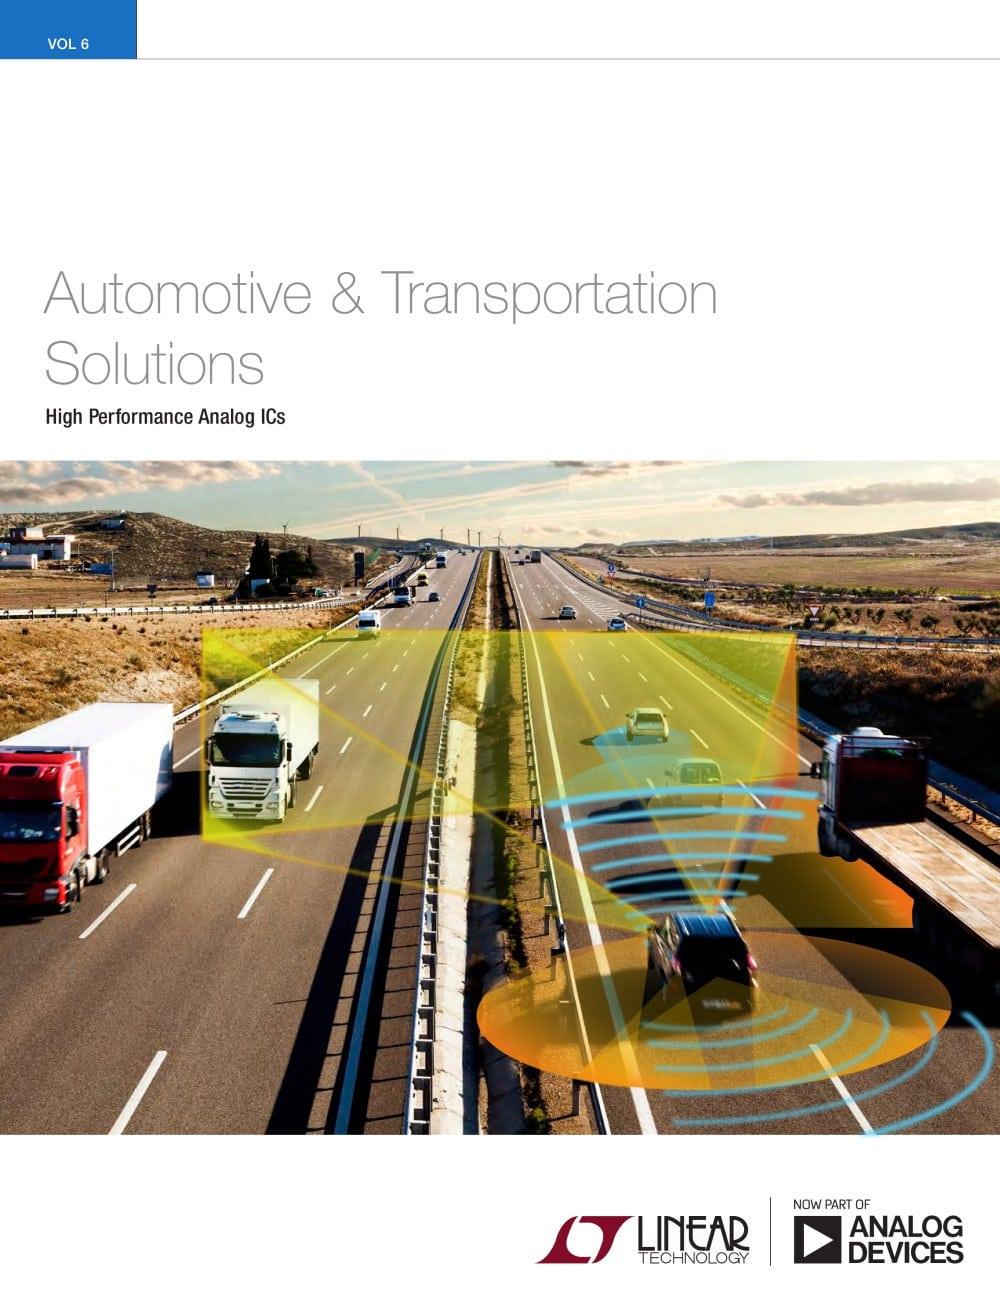 Automotive Transportation Solutions Linear Technology Pdf Monolithic Synchronous Stepdown Dc Converter 1 56 Pages